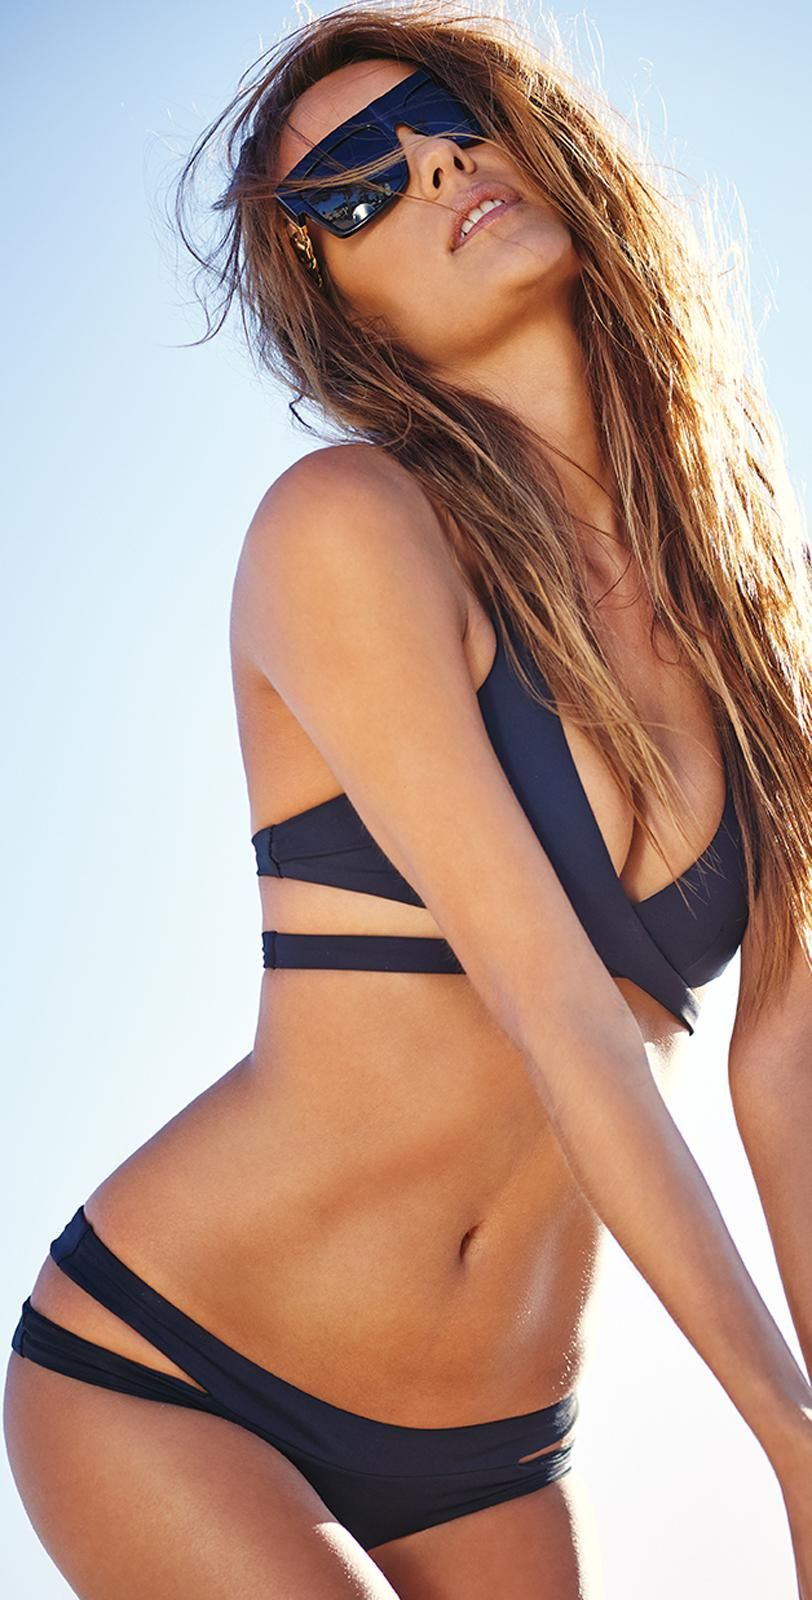 cut images Bikini